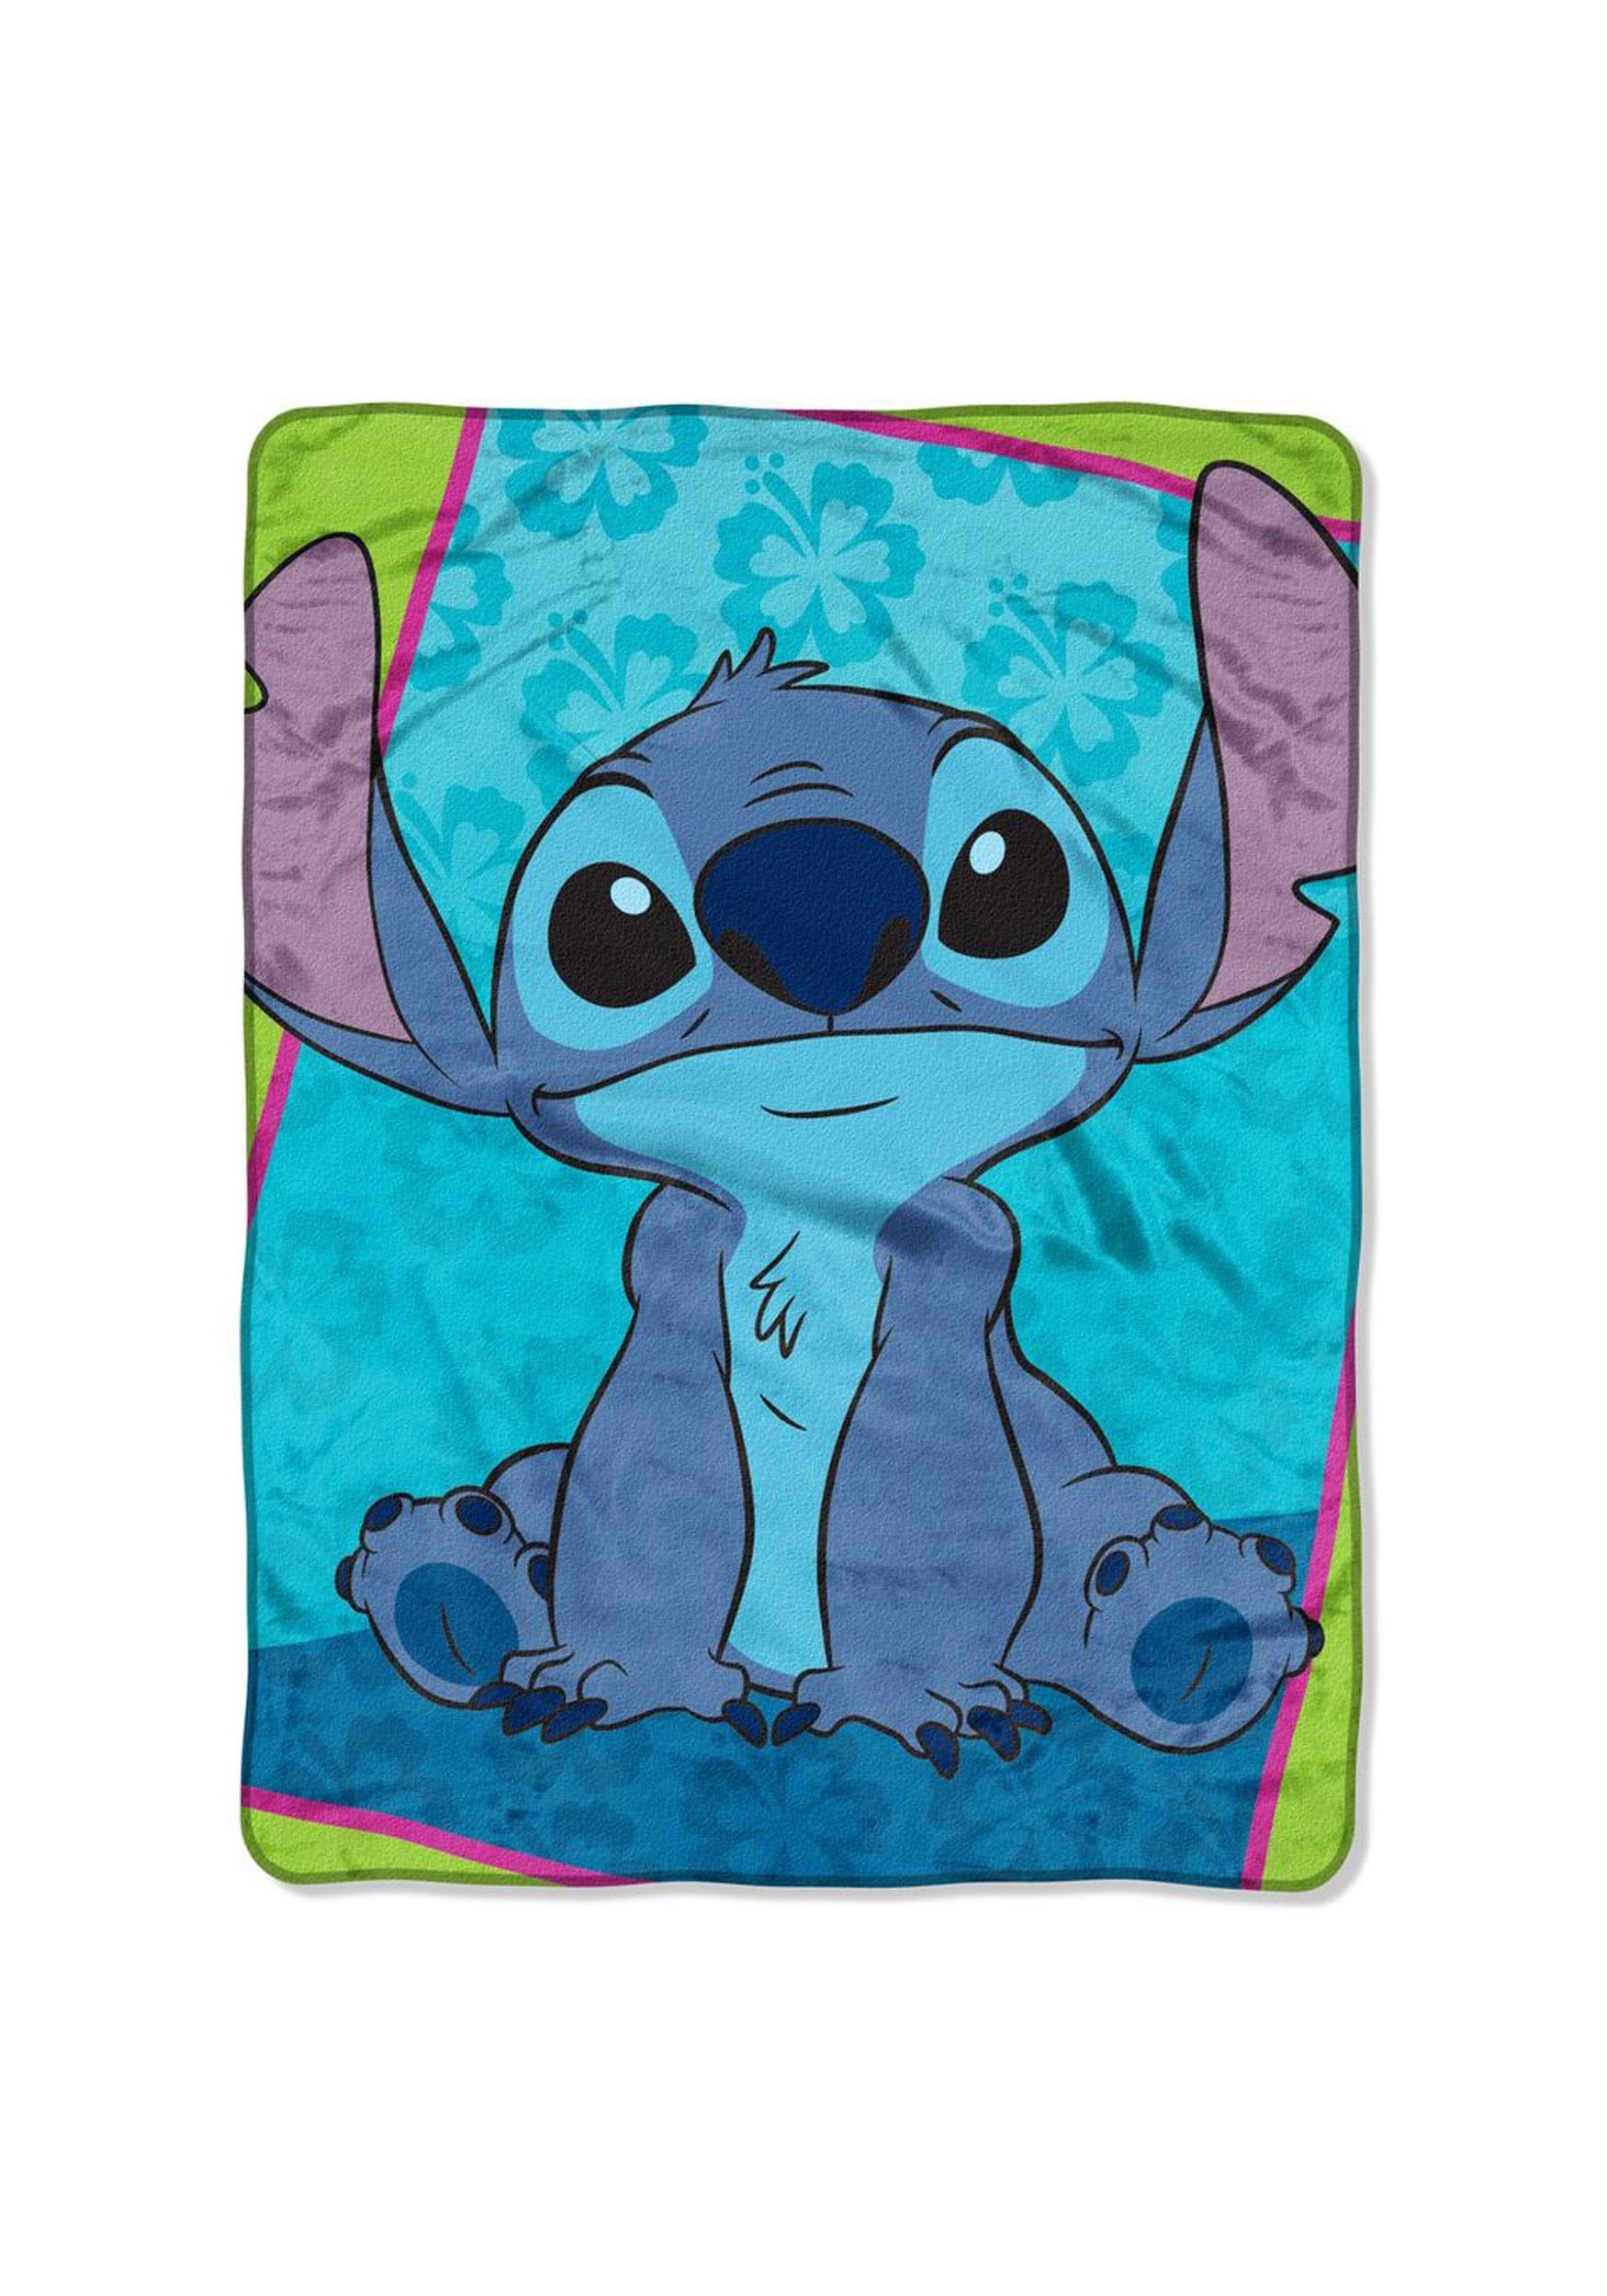 Lilo Stitch Bad But Cute 46 X 60 Super Soft Throw